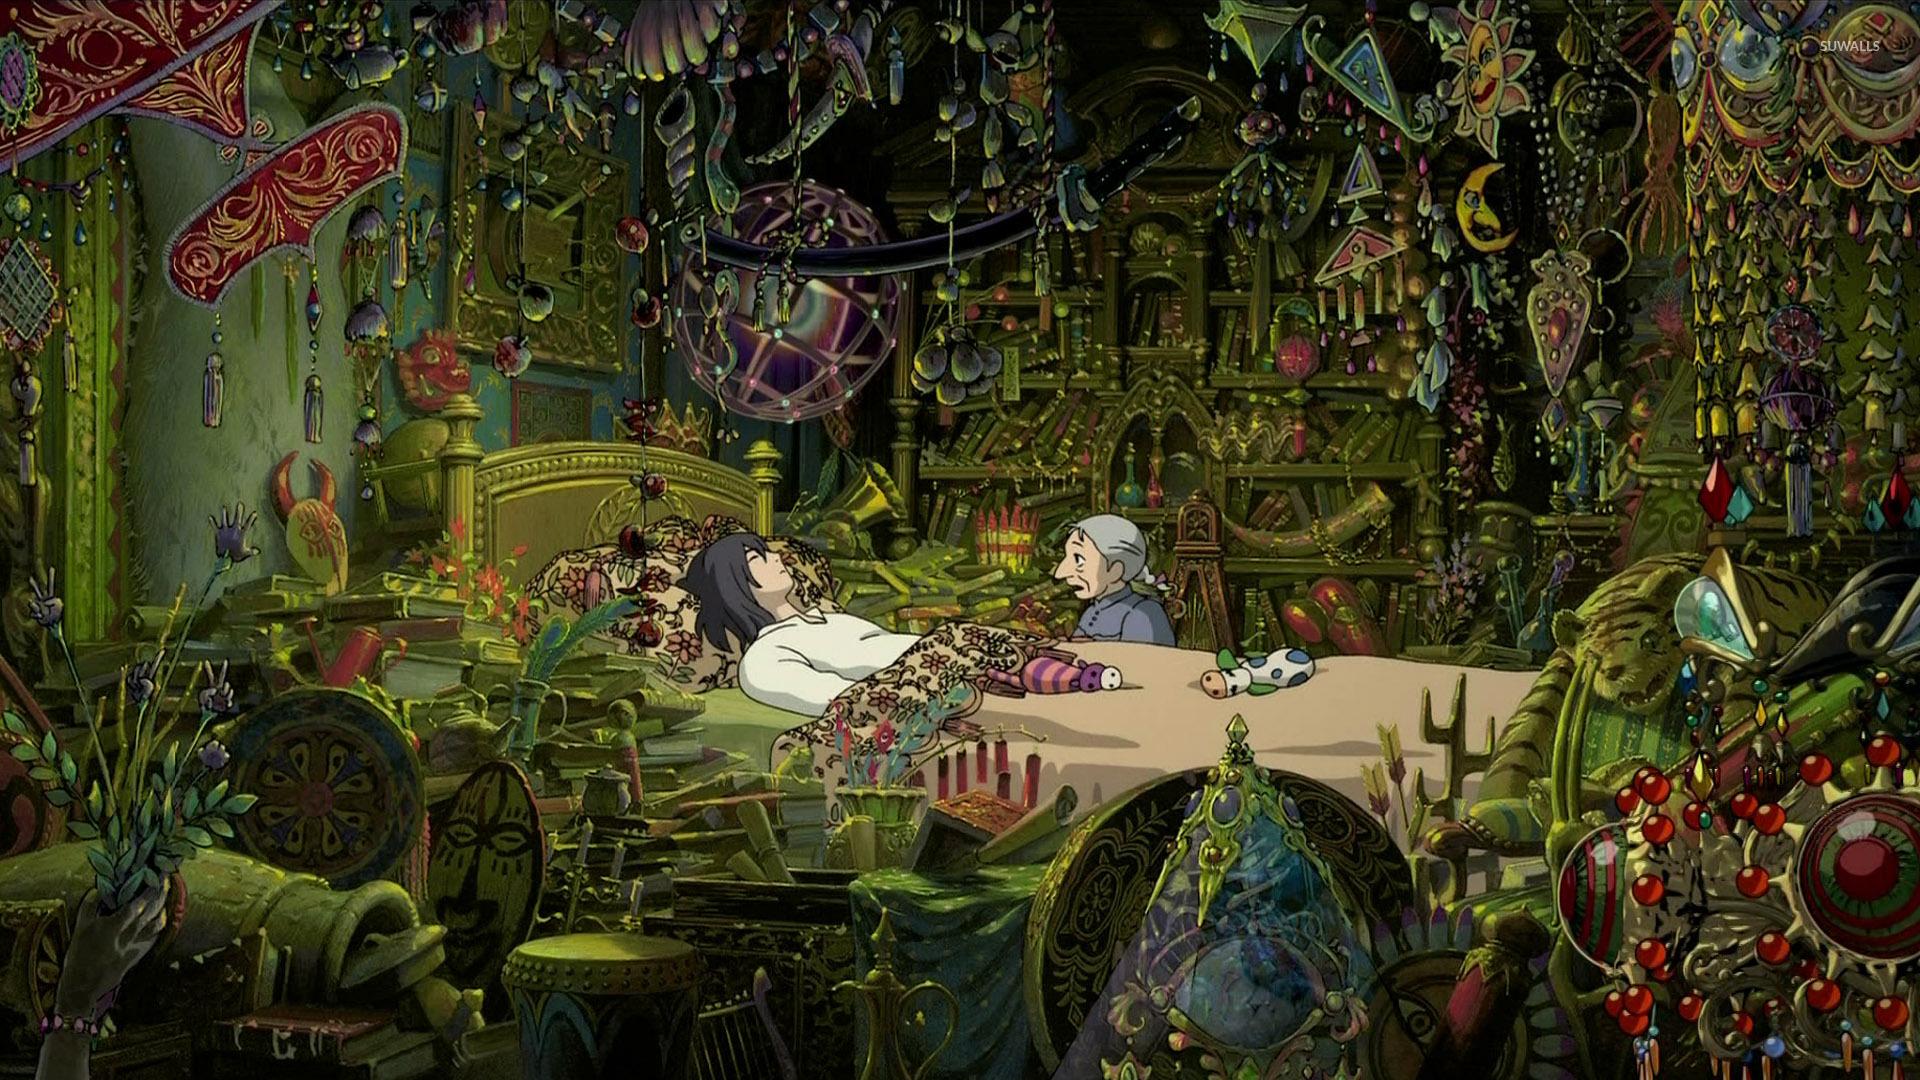 Howl S Moving Castle Wallpaper Anime Wallpapers 30480